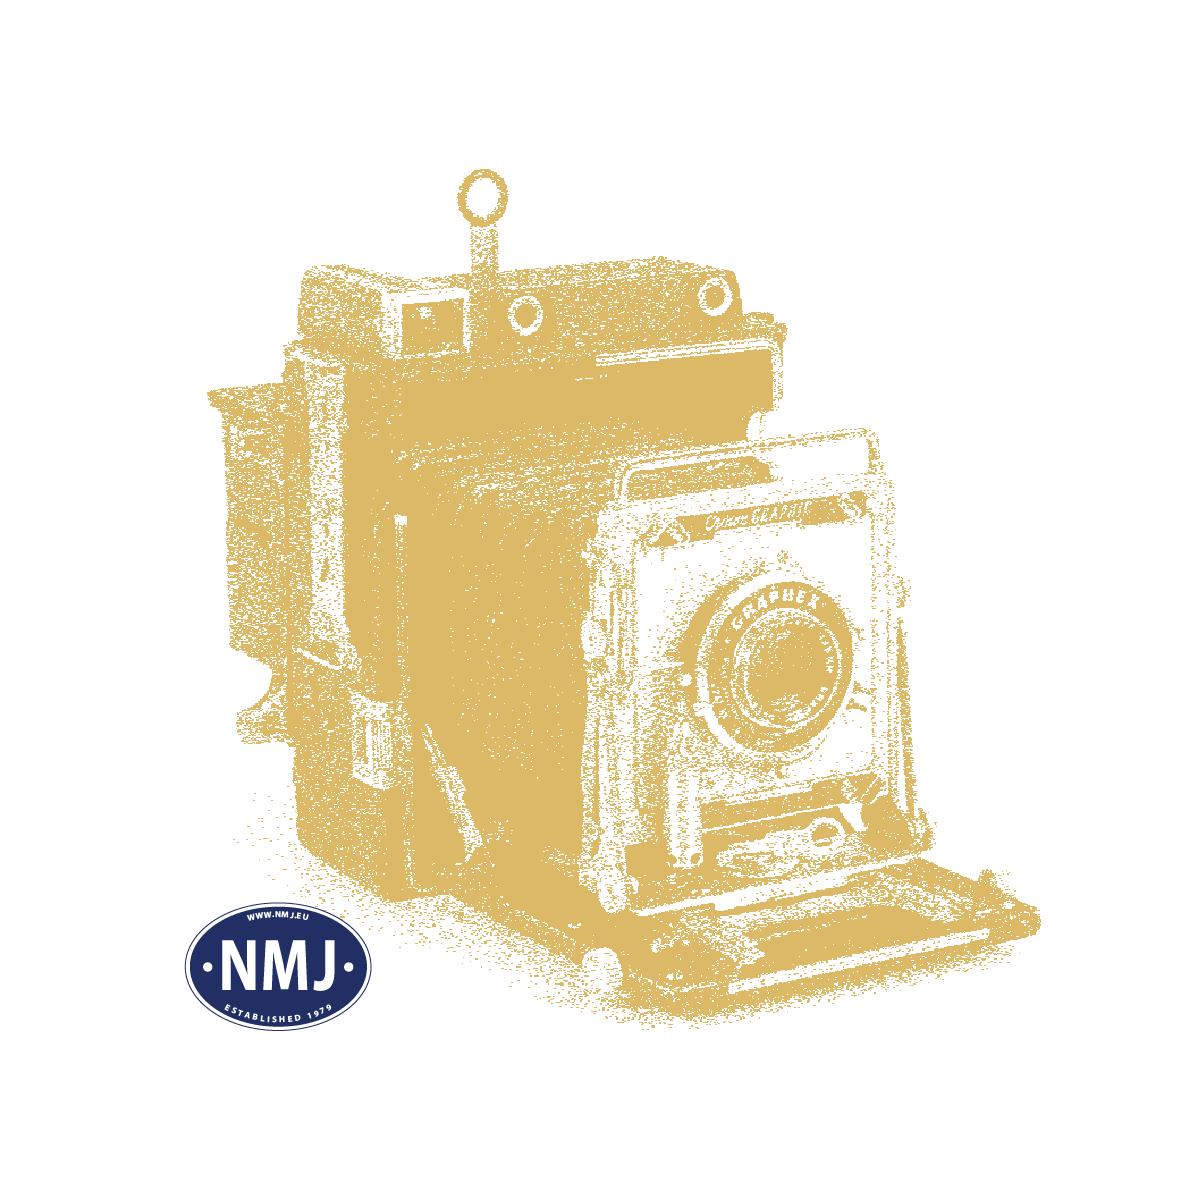 MIG3502 - Oilbrusher, Yellow (Ammo)